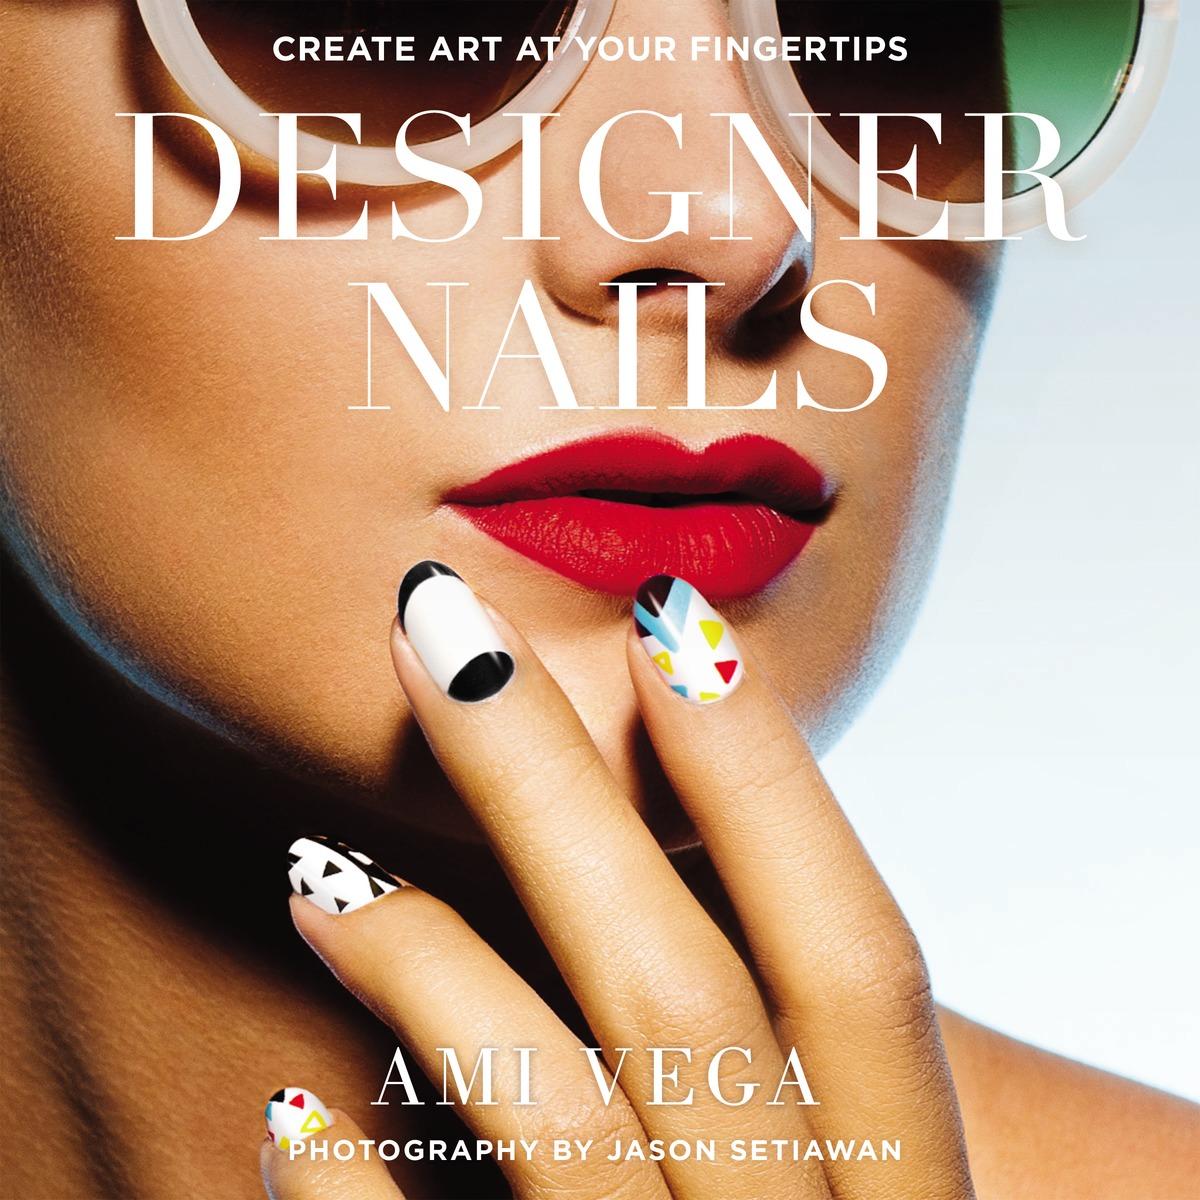 Designer Nails: Create Art at Your Fingertips